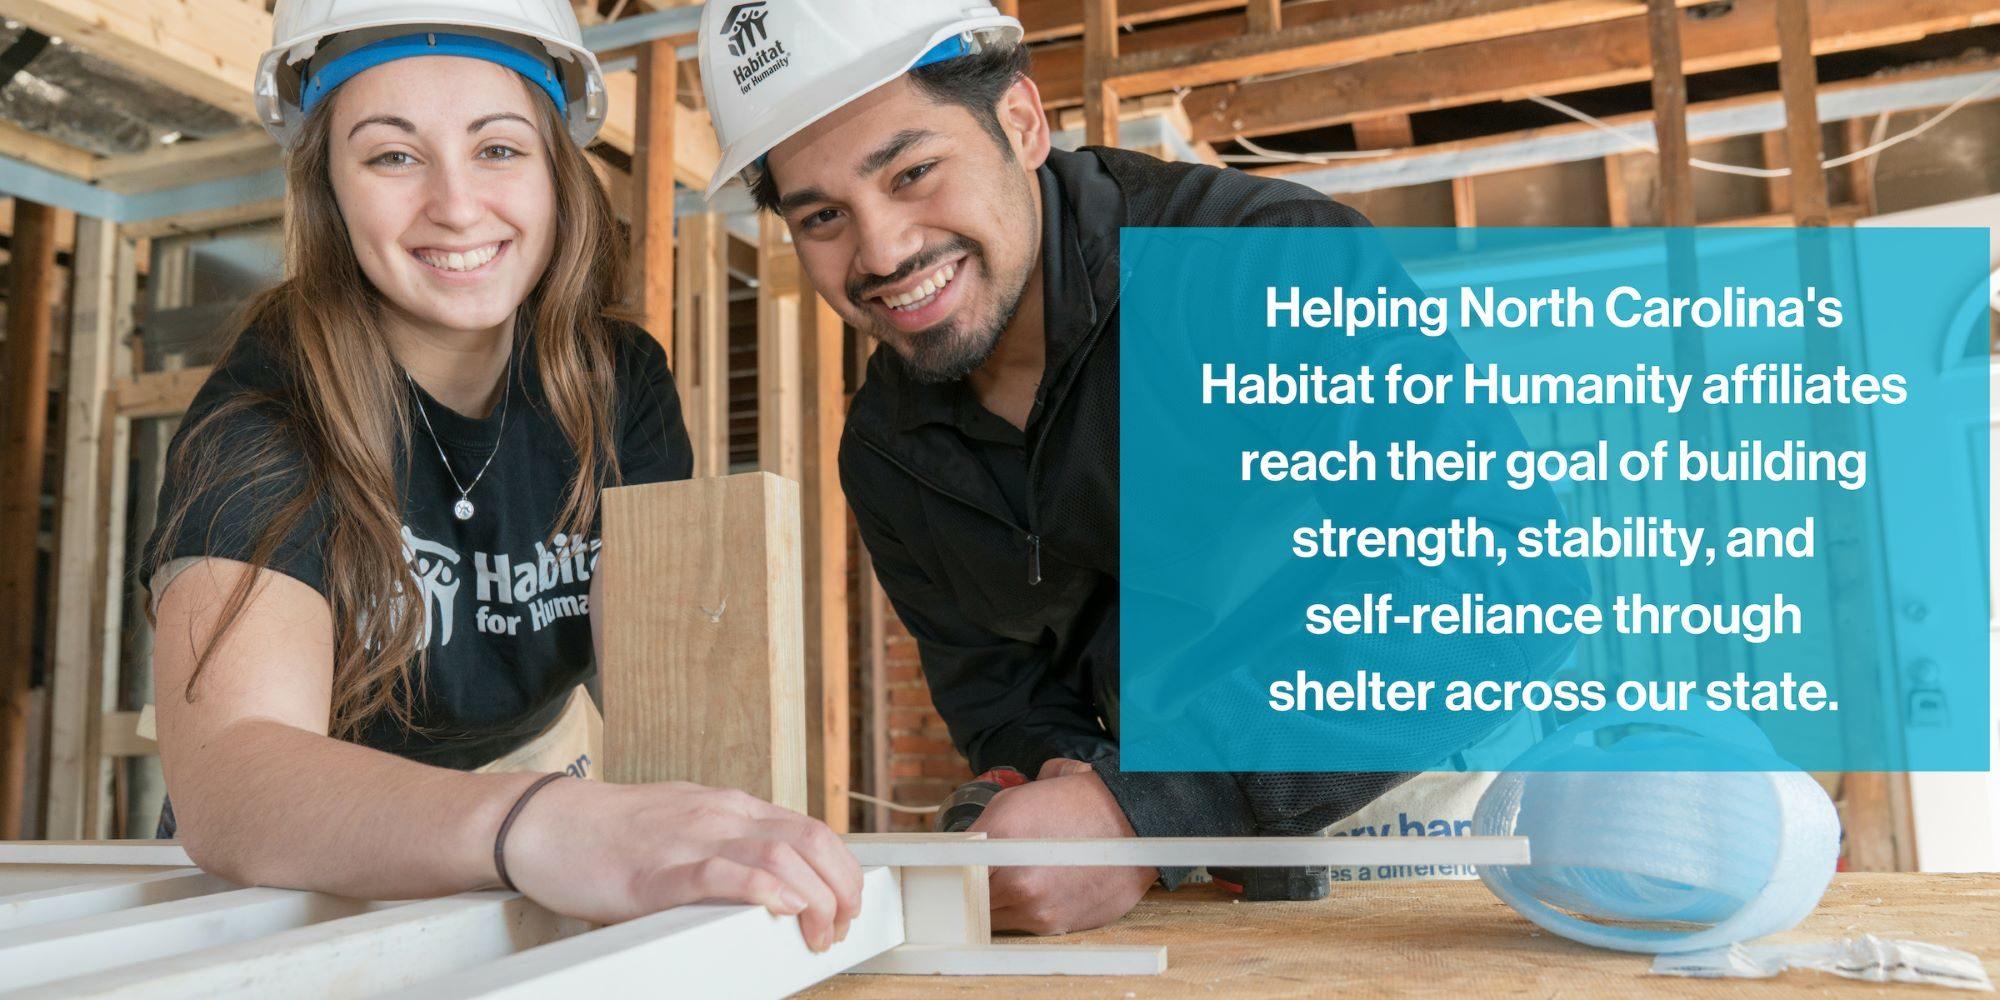 Habitat for Humanity of North Carolina